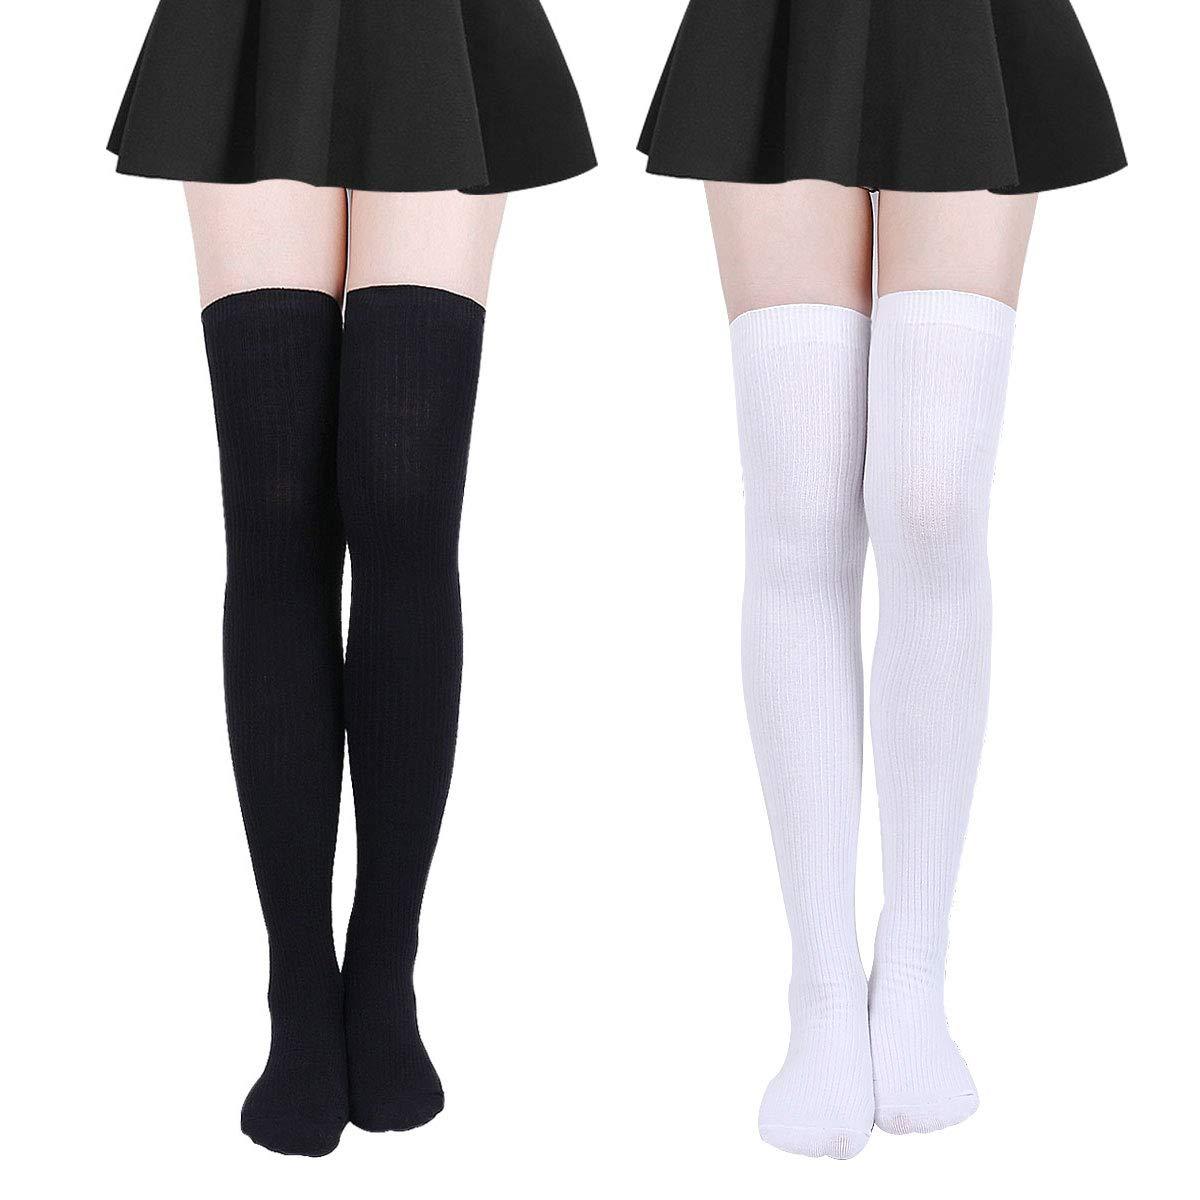 Overknee Str/ümpfe Streifen Lange Socken Retro Knitting Str/ümpfe M/ädchen Cheerleader Sportsocken Baumwollstr/ümpfe Damen Kniestr/ümpfe